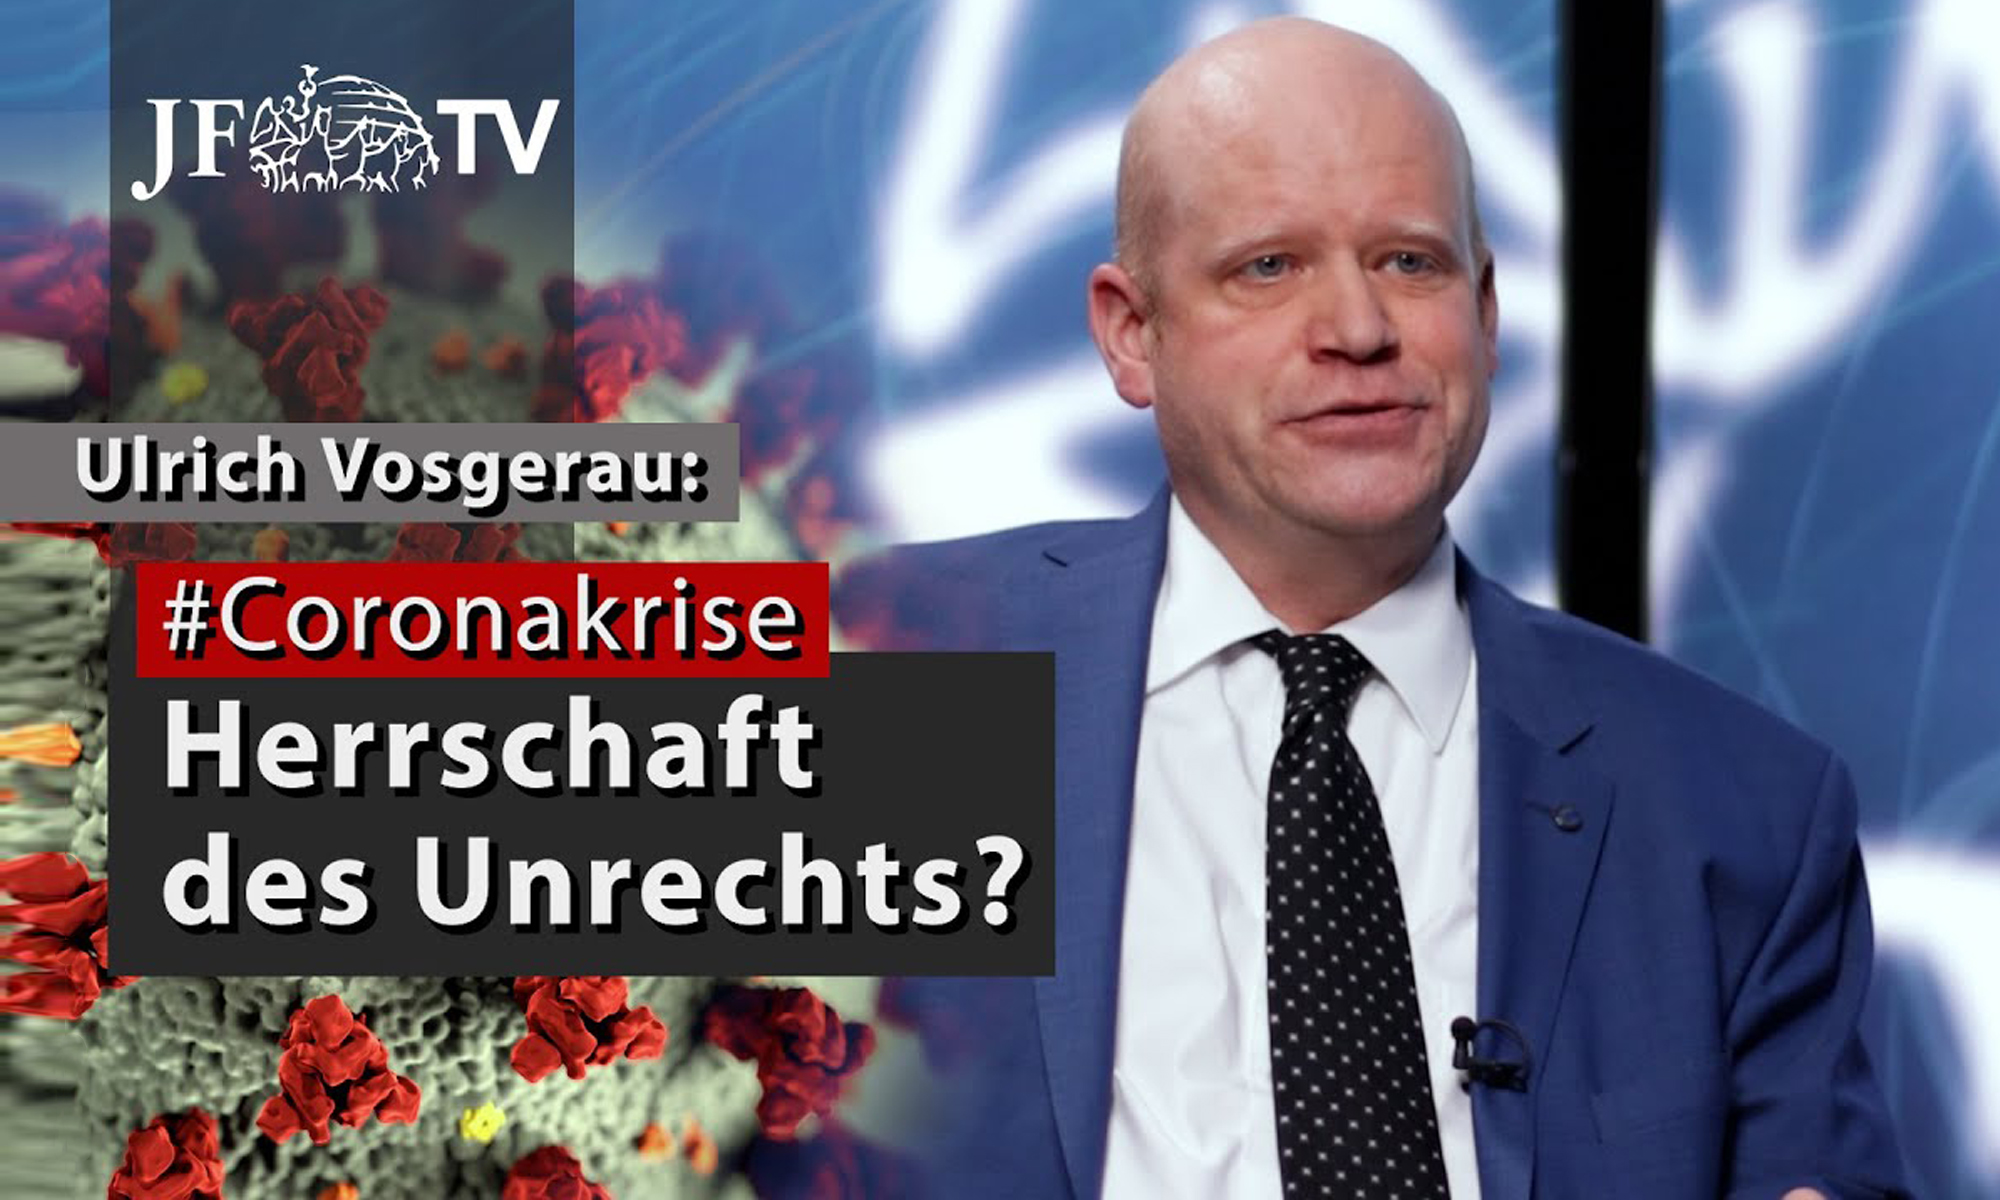 Ulrich Vosgerau